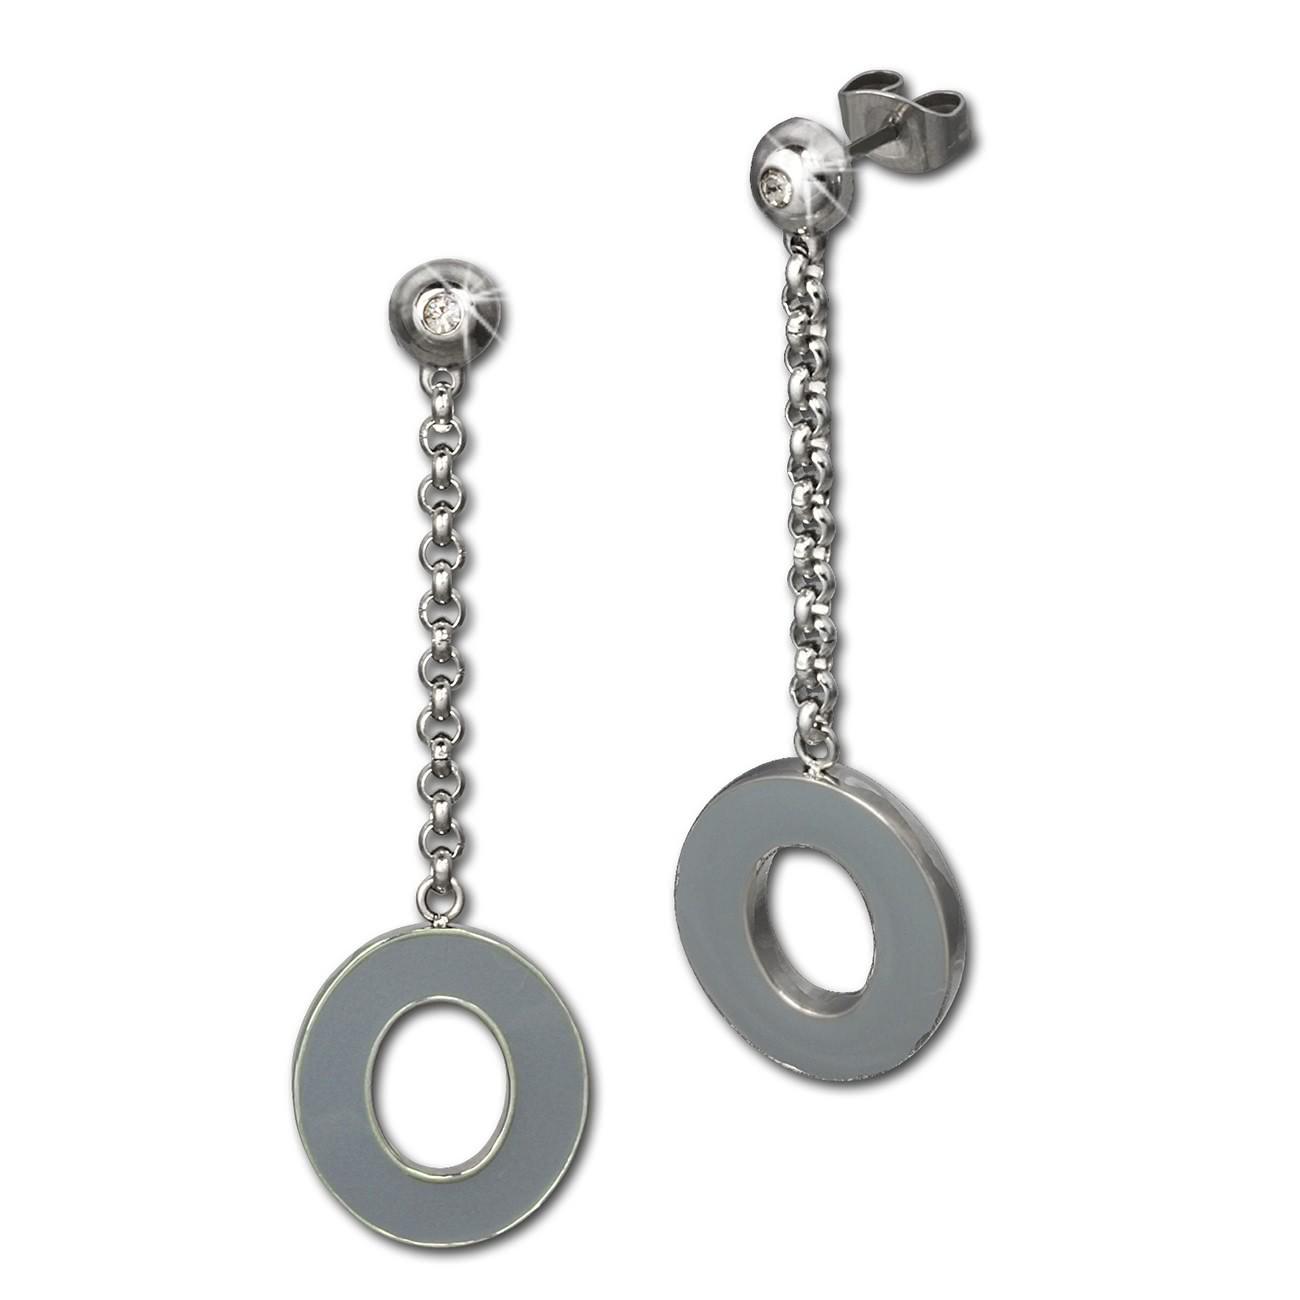 Amello Ohrstecker Oval Zirkonia Emaille grau Ohrringe Damen Stahl ESOG03K